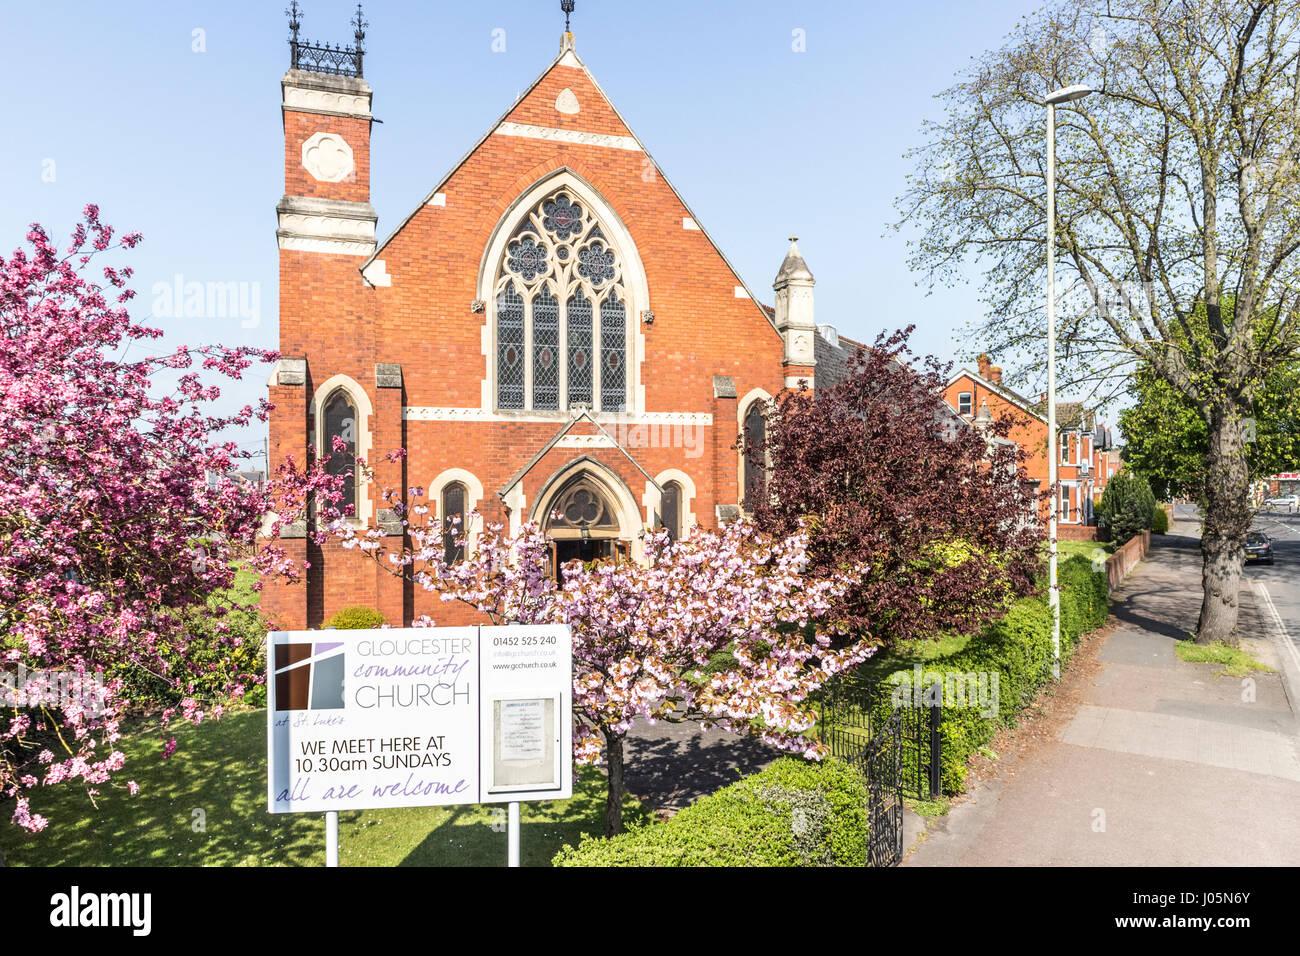 Gloucester Community Churh in springtime, Gloucester UK - Stock Image